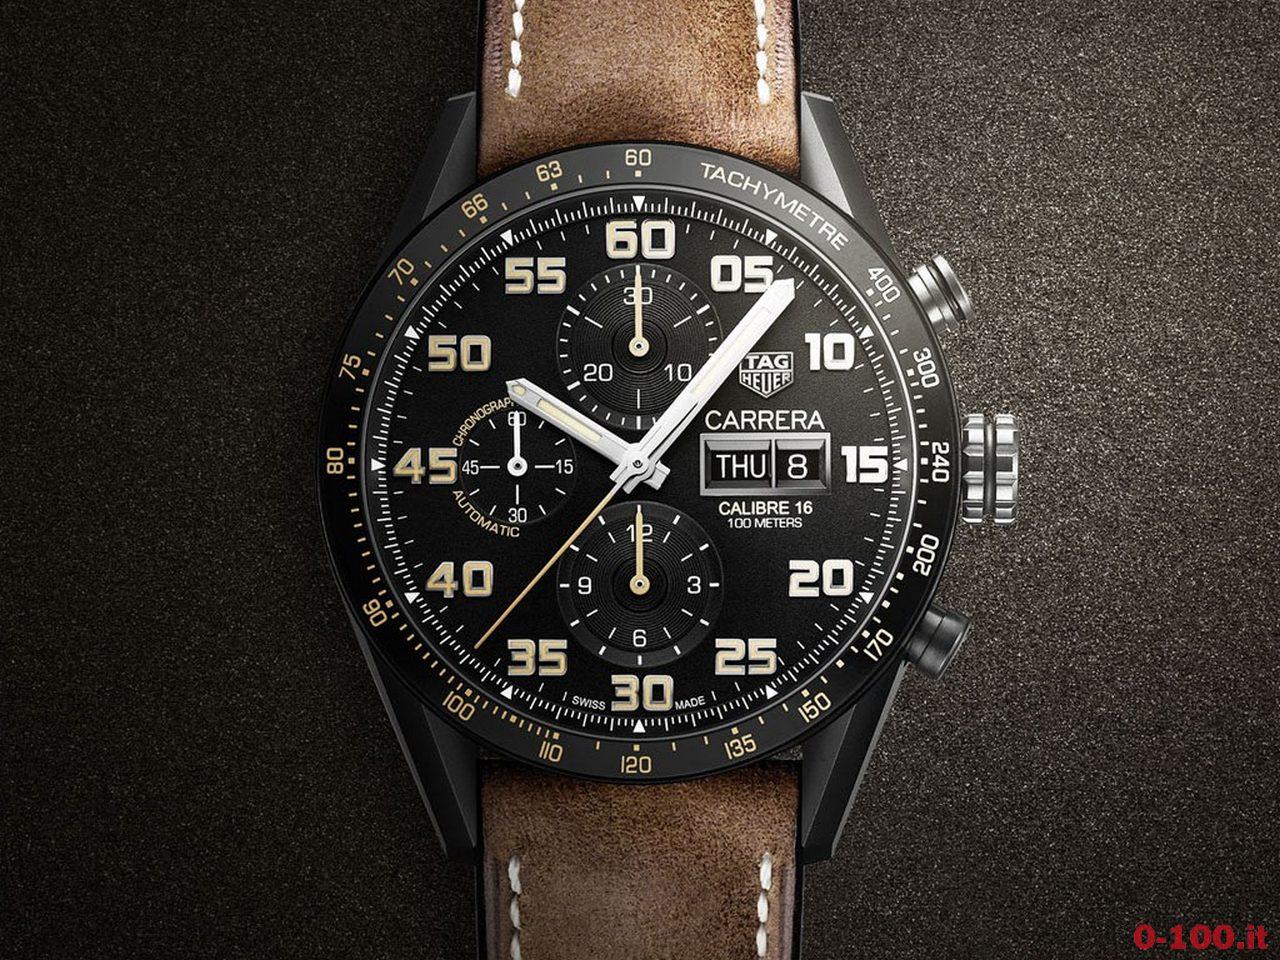 tag-heuer-carrera-calibre-16-day-date-chronograph-black-titanium-ref-cv2a84-fc6394_0-1001